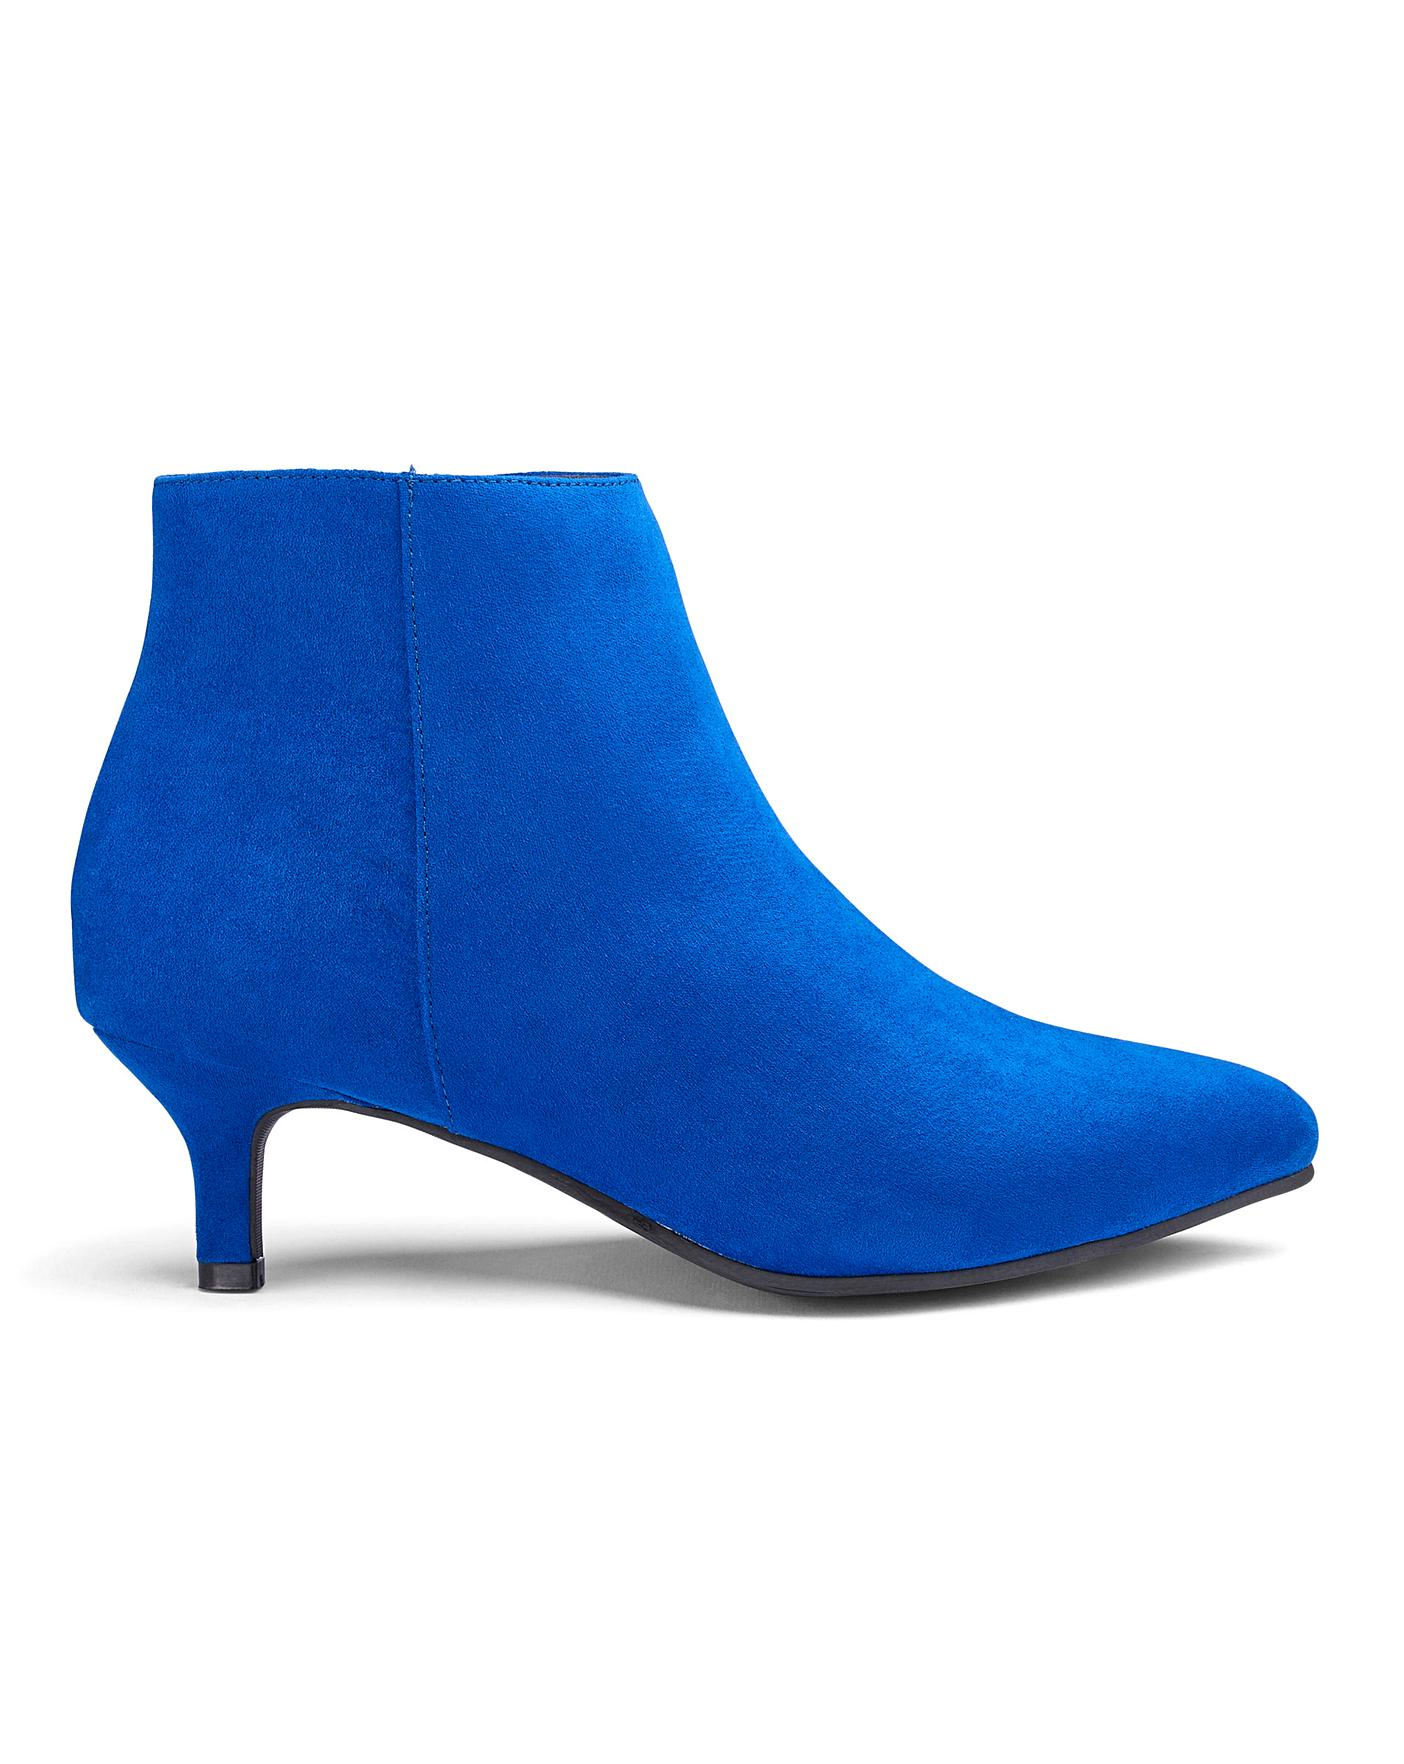 a82d9b4728c9 Flexi Sole Kitten Heel Ankle Boots E Fit